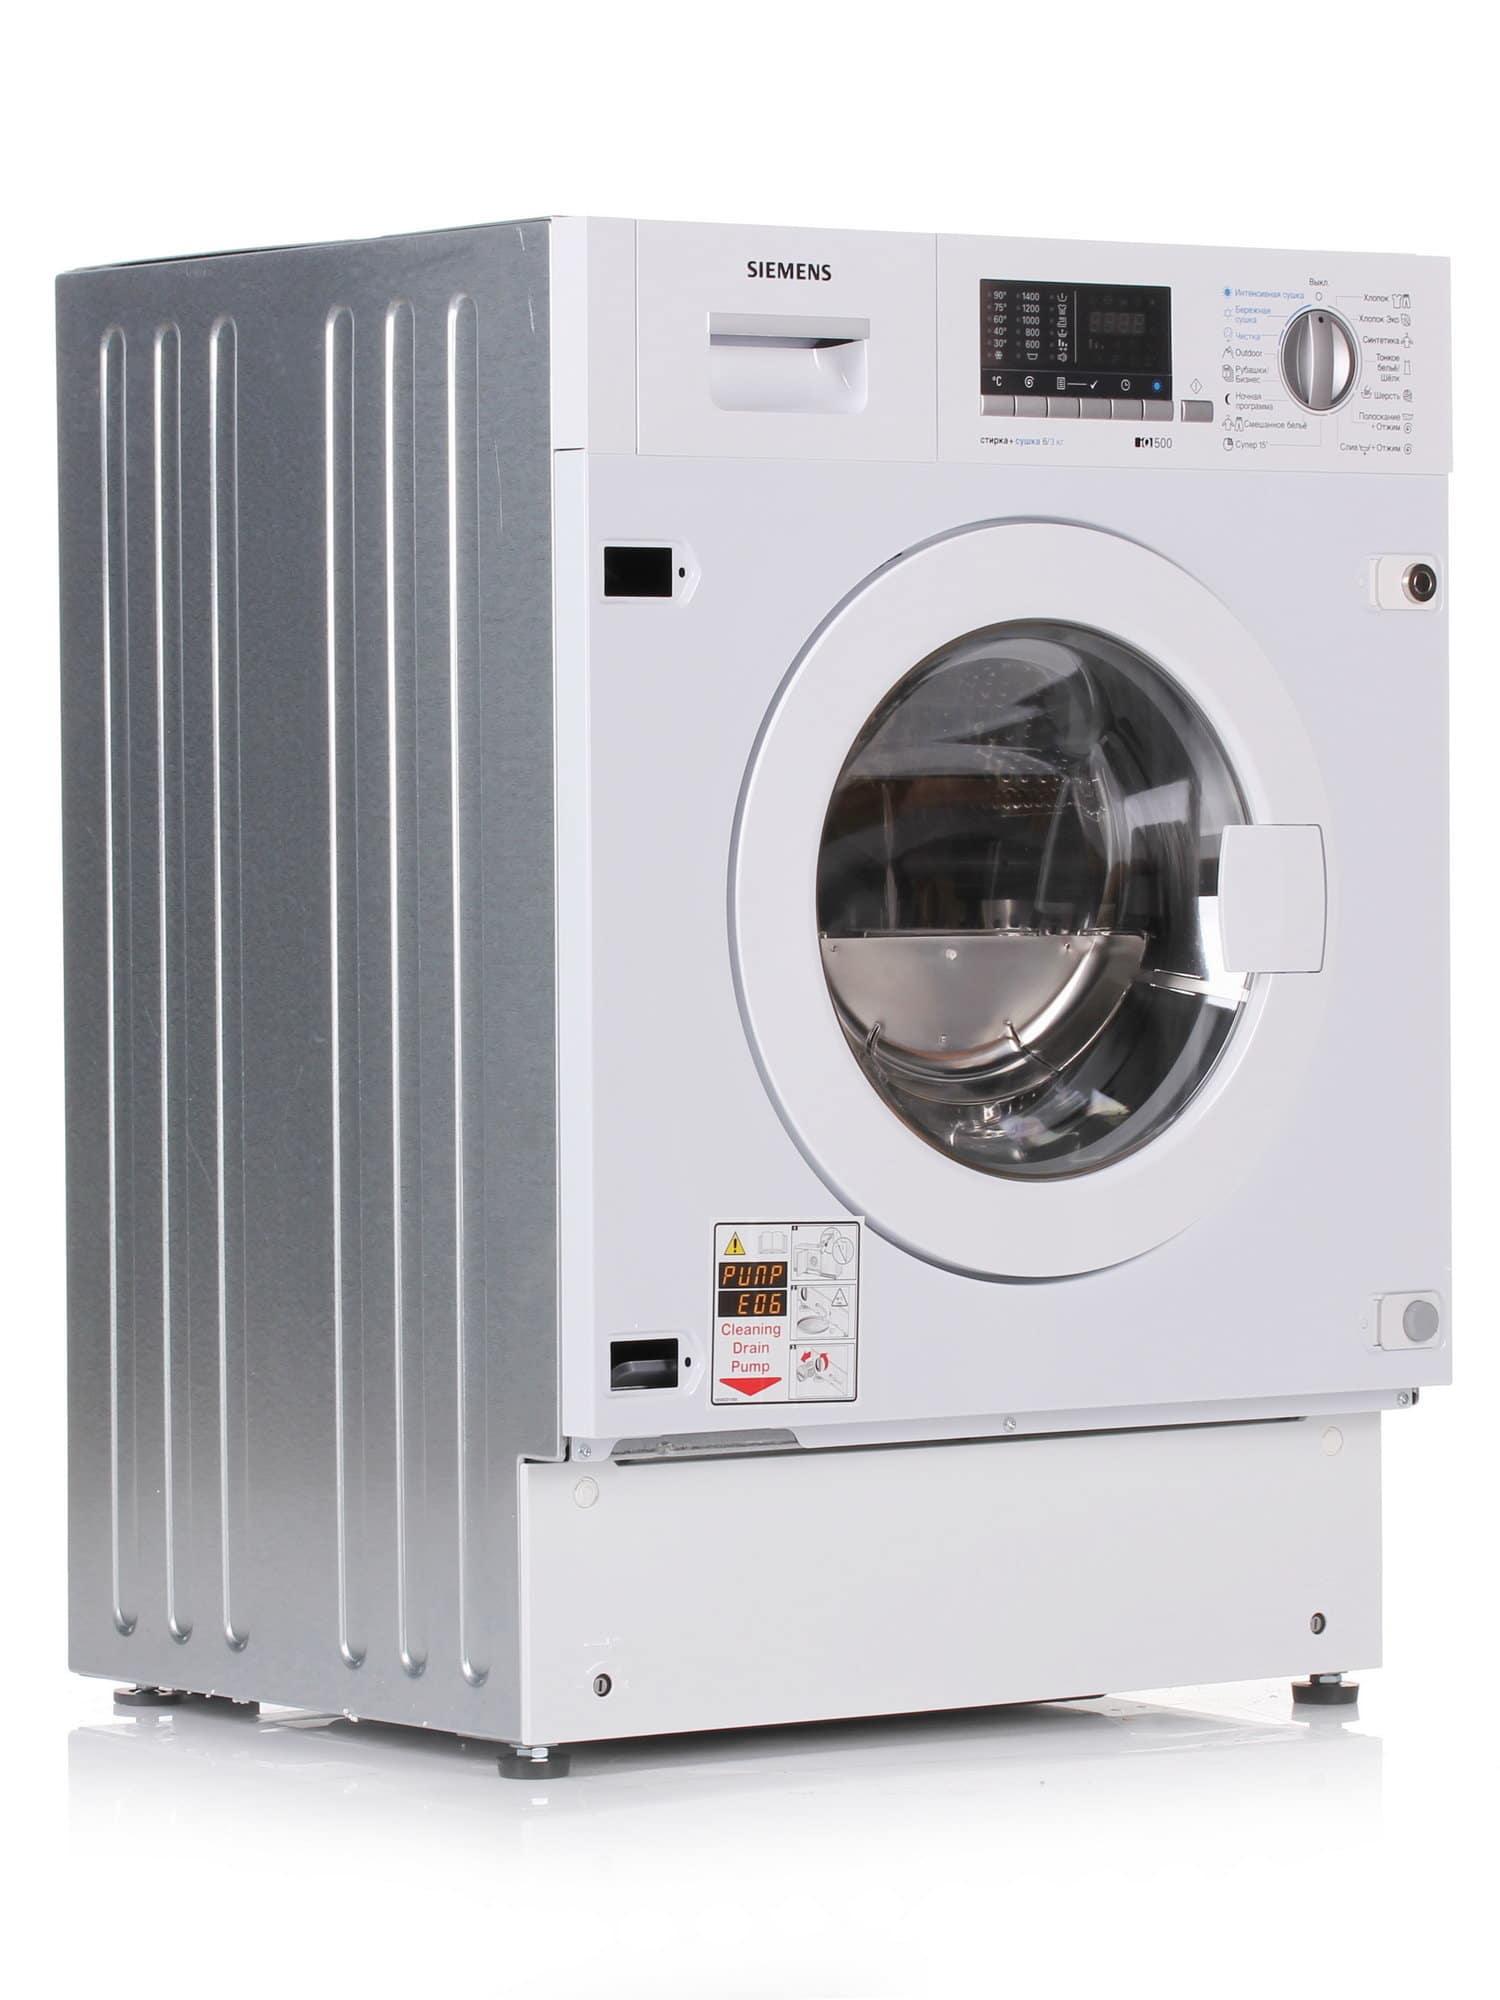 Модель Siemens WK 14D540